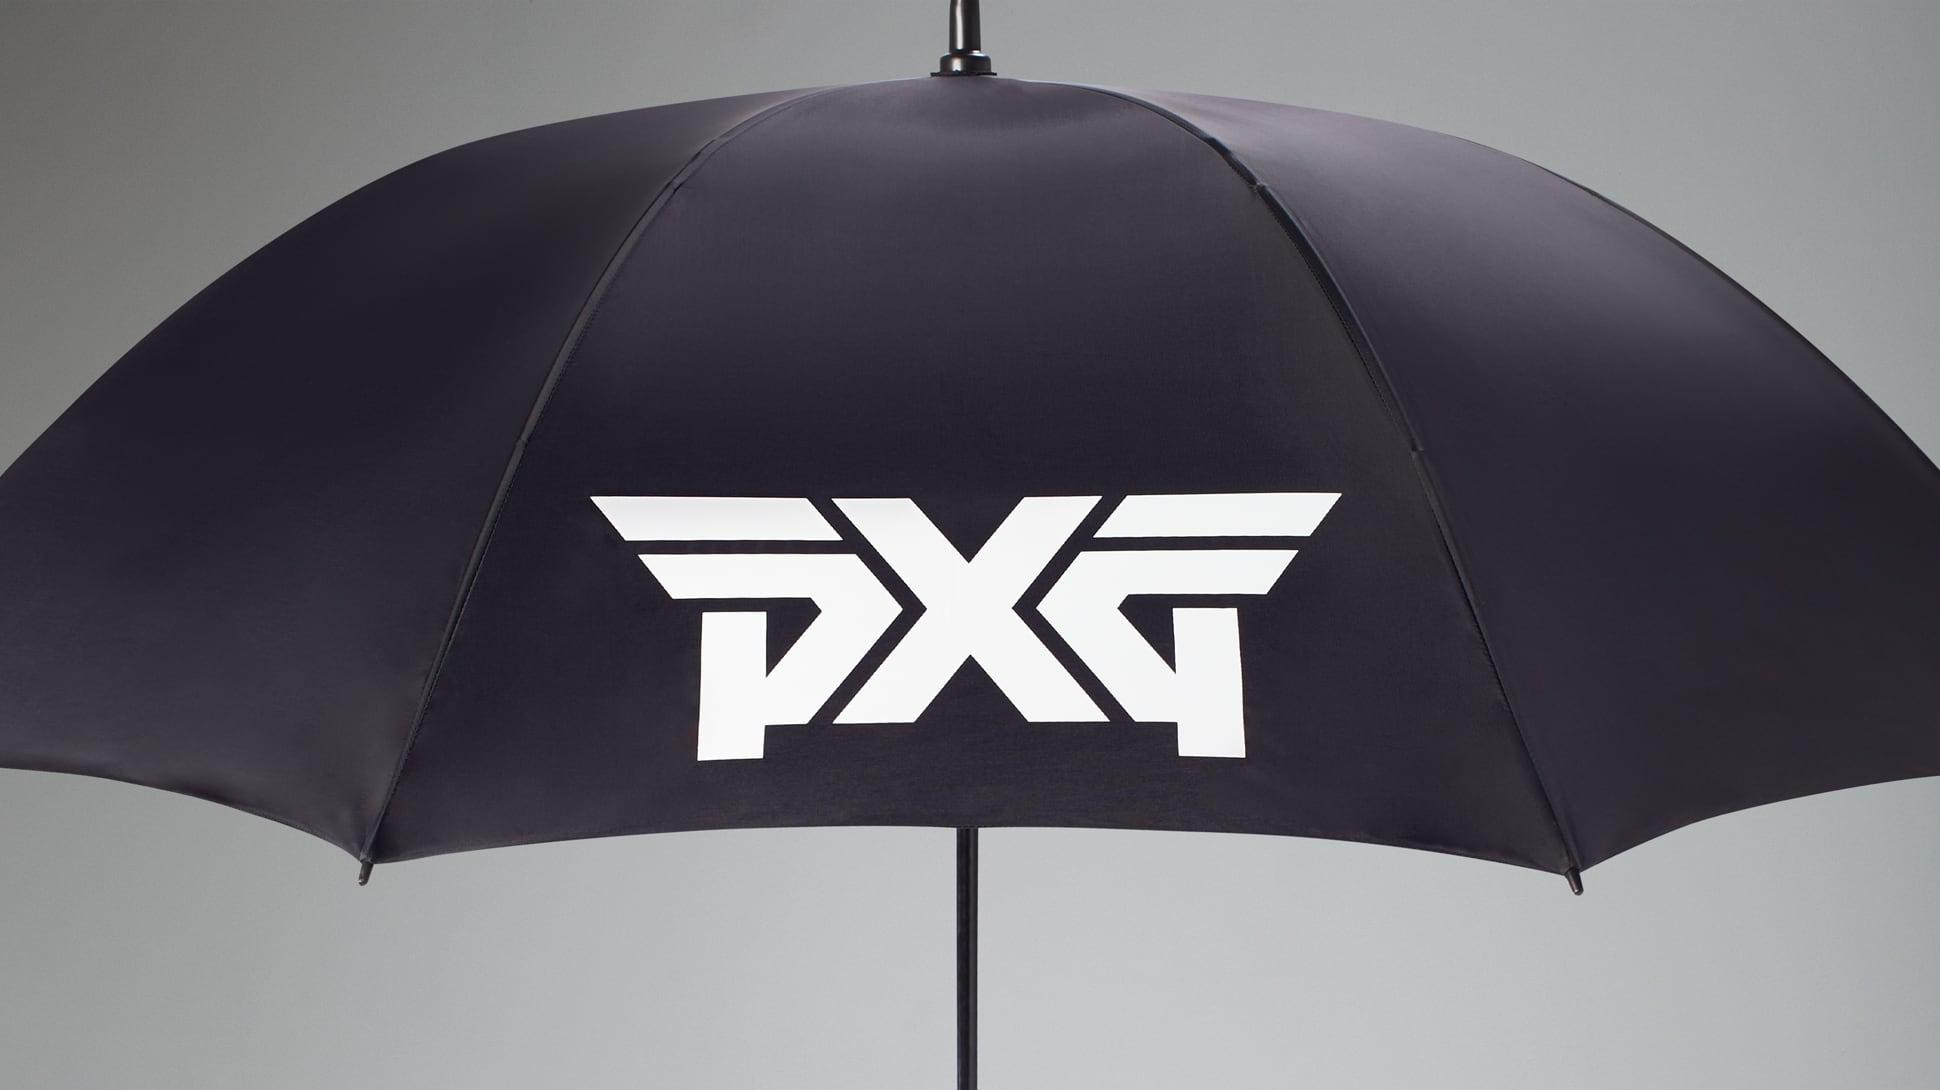 Single Canopy Umbrella Image 3